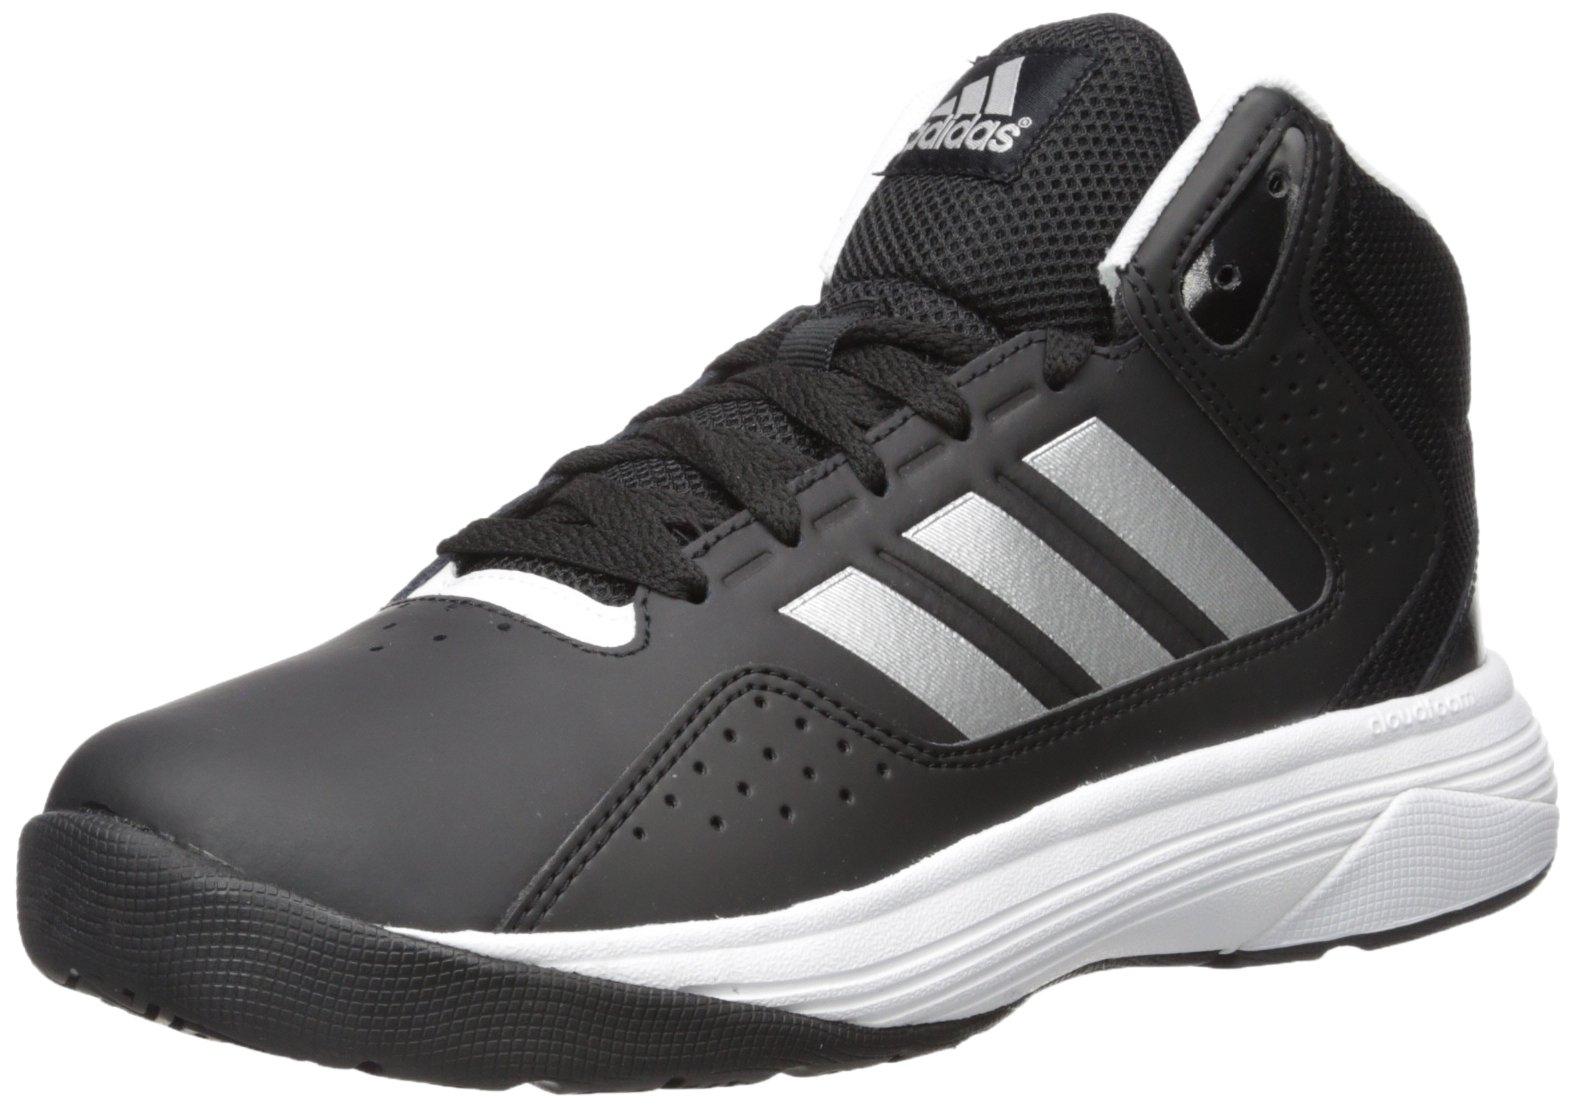 adidas NEO Men s Cloudfoam Ilation Mid Wide Basketball Shoe product image 8ee3d7c48